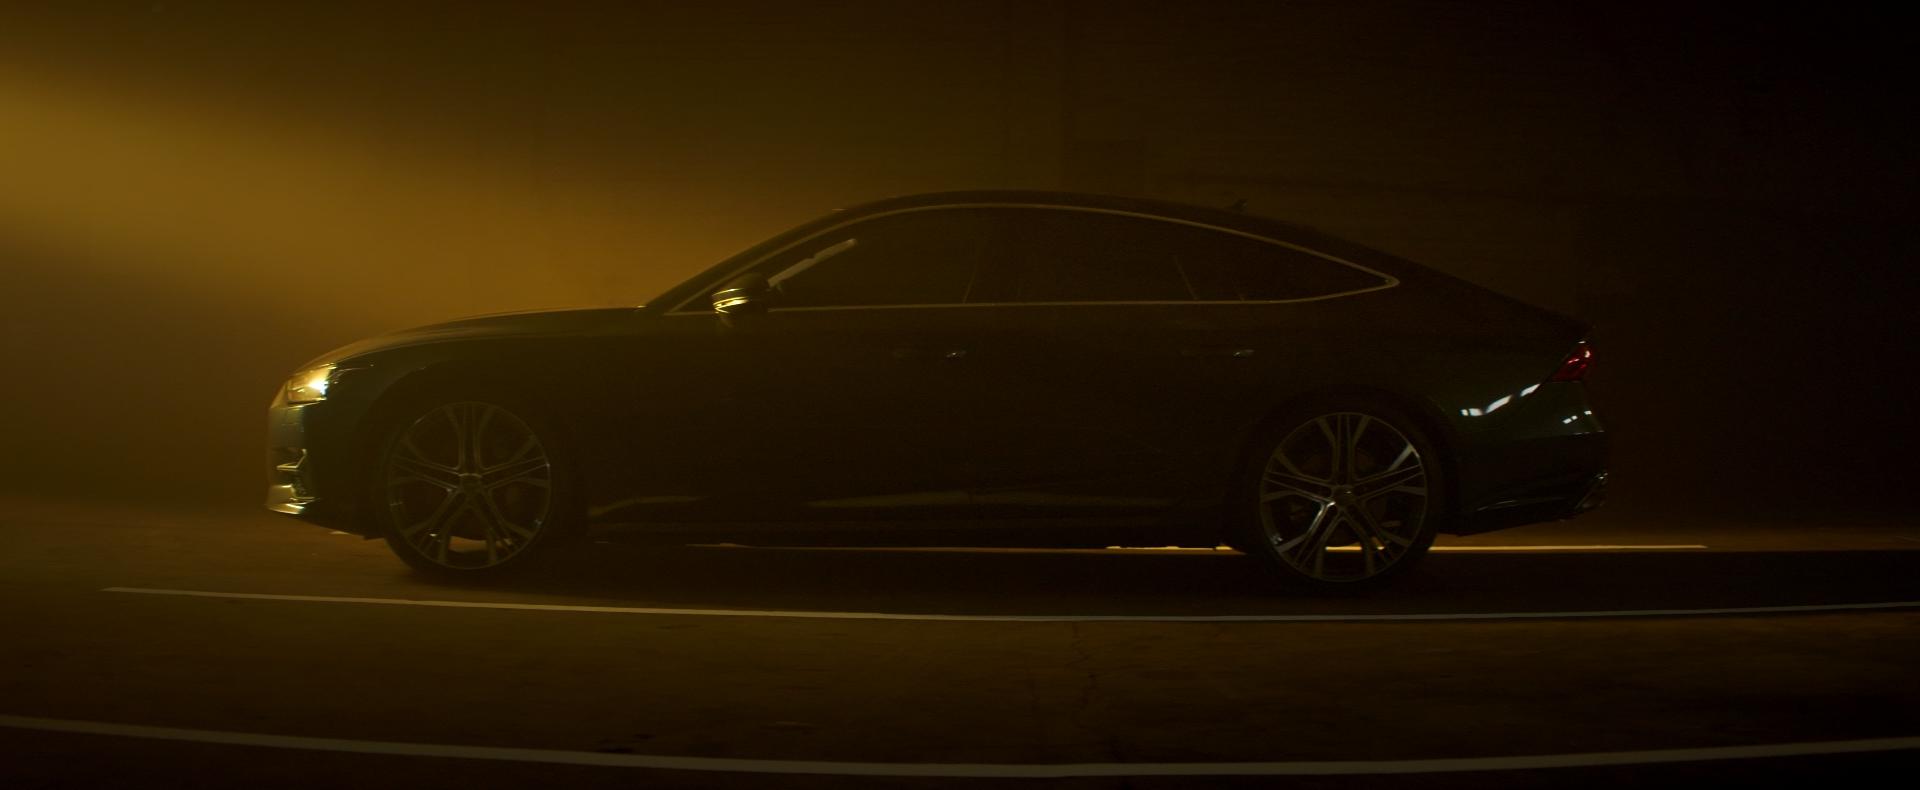 Audi A7_1.1.32.jpg